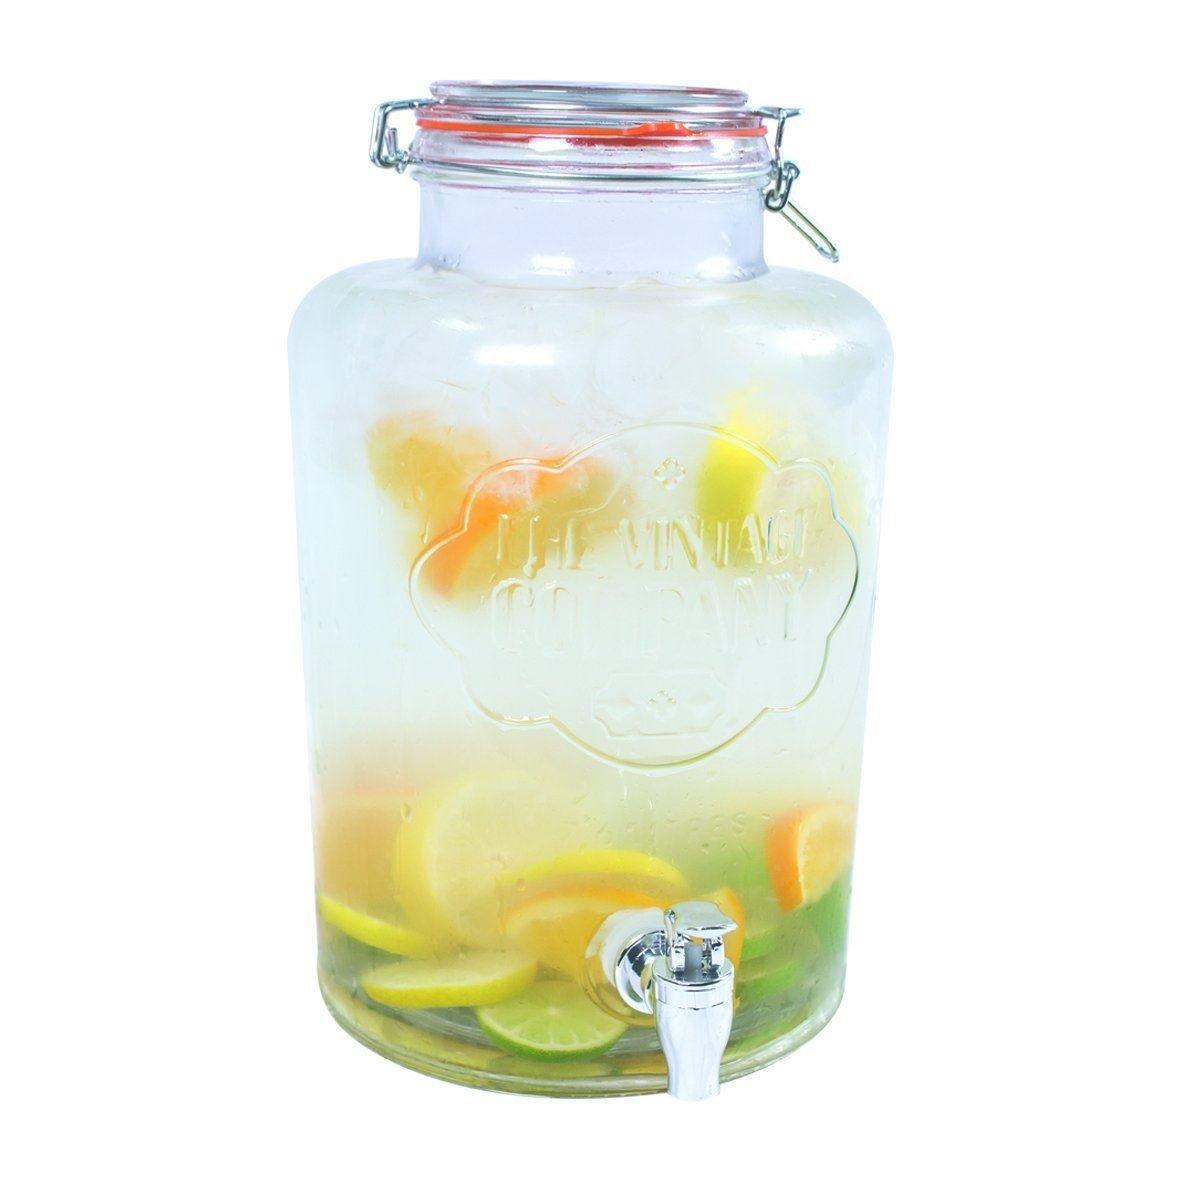 Unibos Large 7.6Litter Glass Jumbo Jar W- Buy Online in Malta at Desertcart